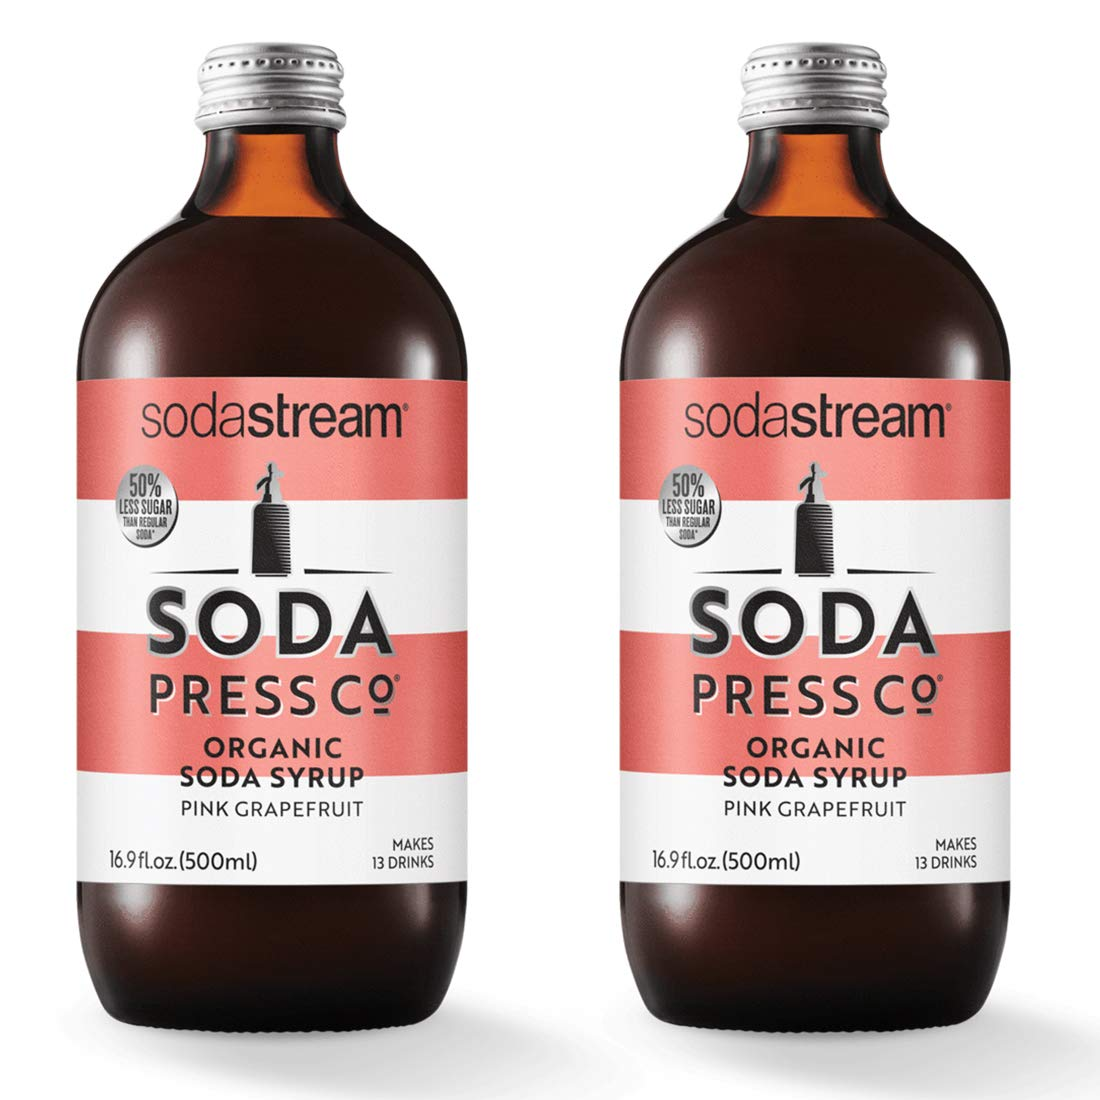 Soda Press Organic Pink Grapefruit Flavor Mix for SodaStream, 16.9 Fl Oz, 2 Pk